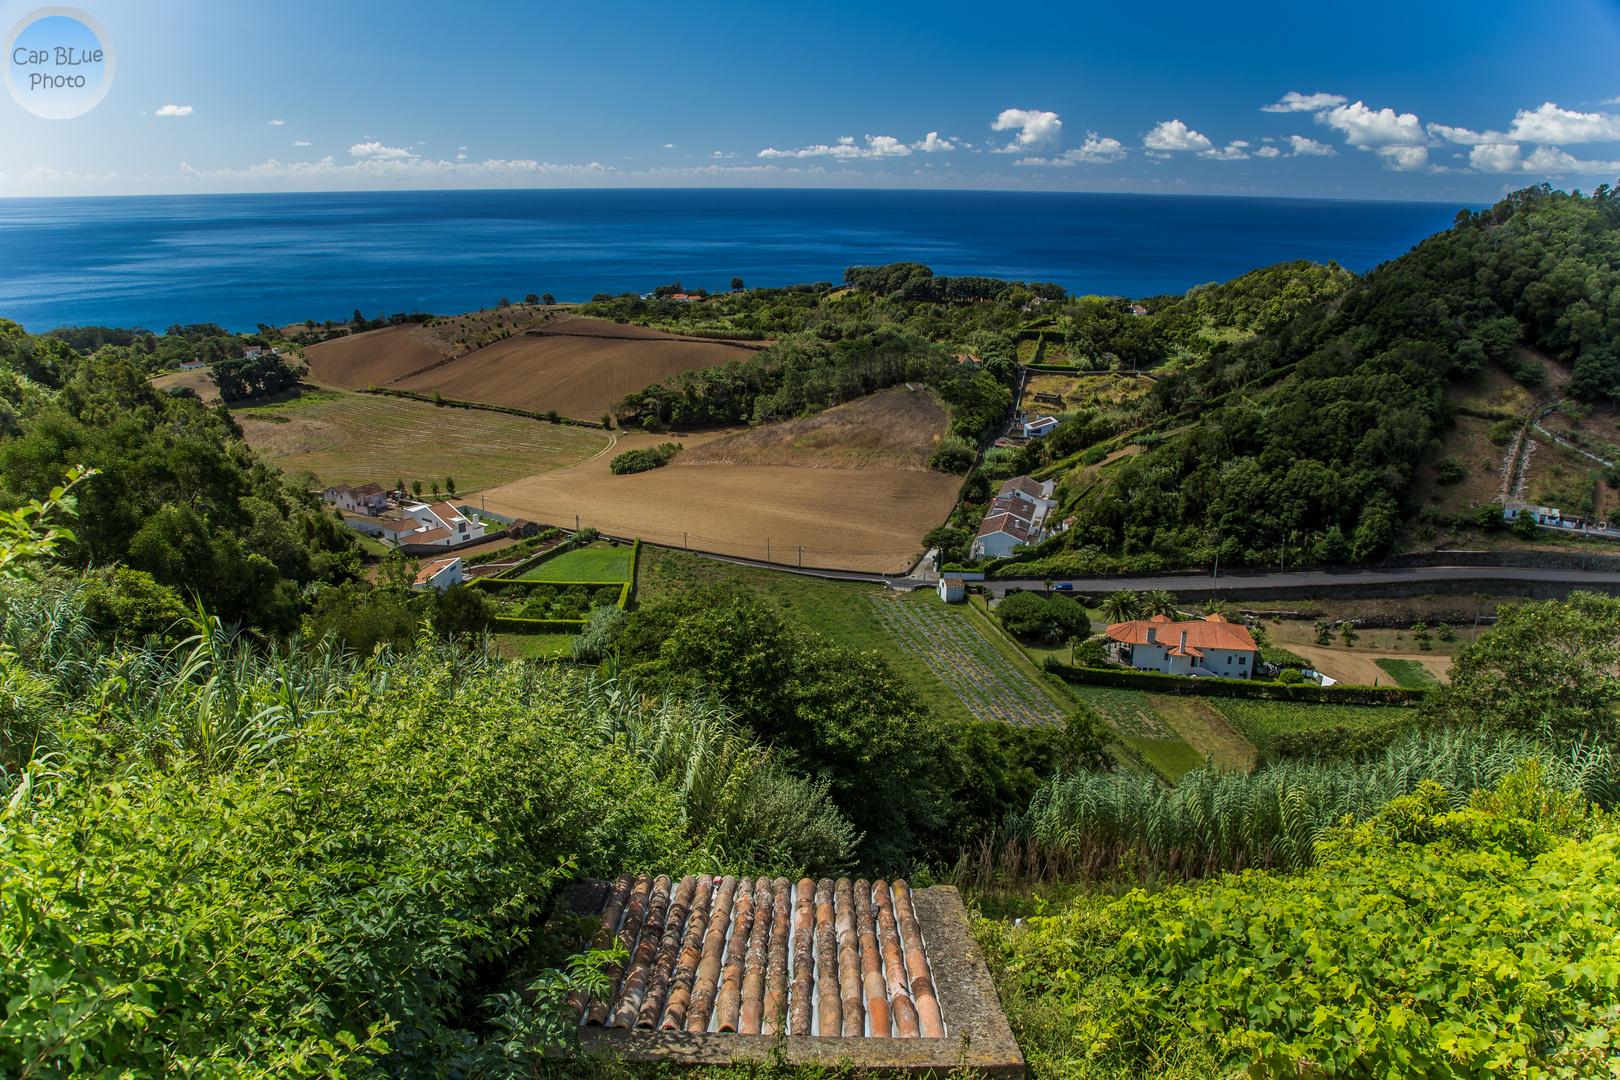 Caloura - Herrliches grünes Land im Bezirk Lagoa